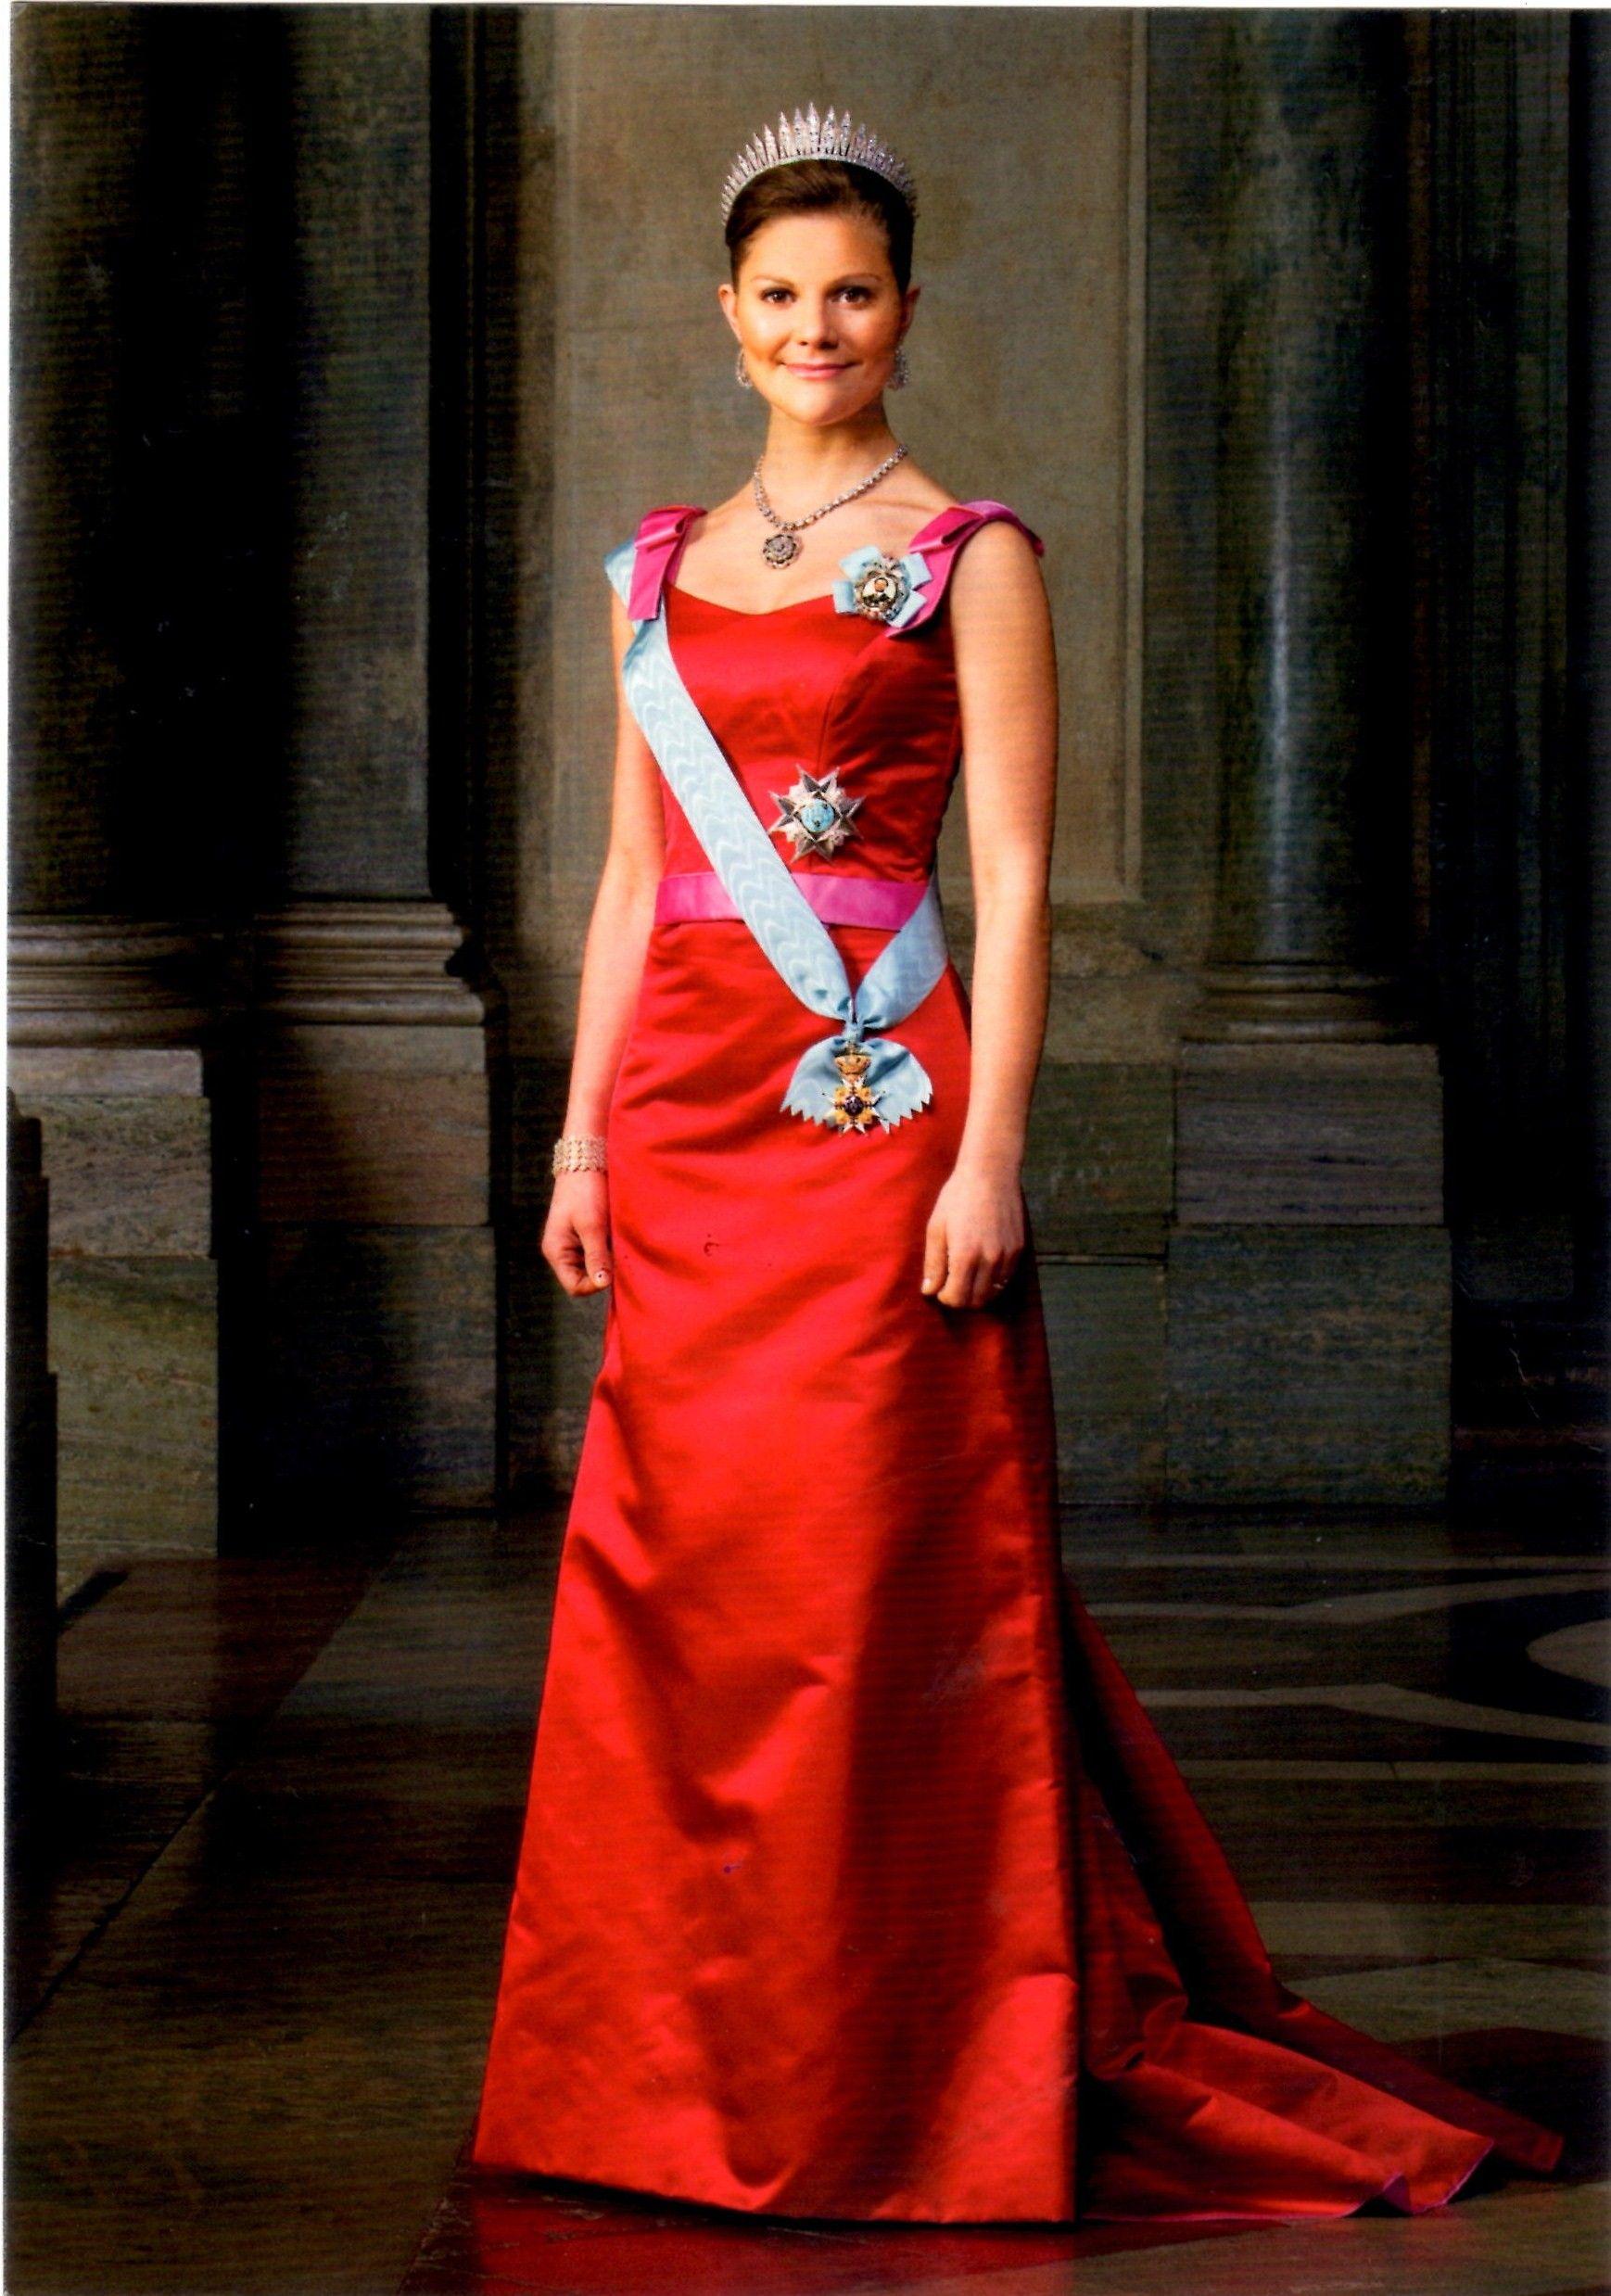 Swedish Crown Braid Tutorial: Crown Princess Victoria Of Sweden, In Full Rig.